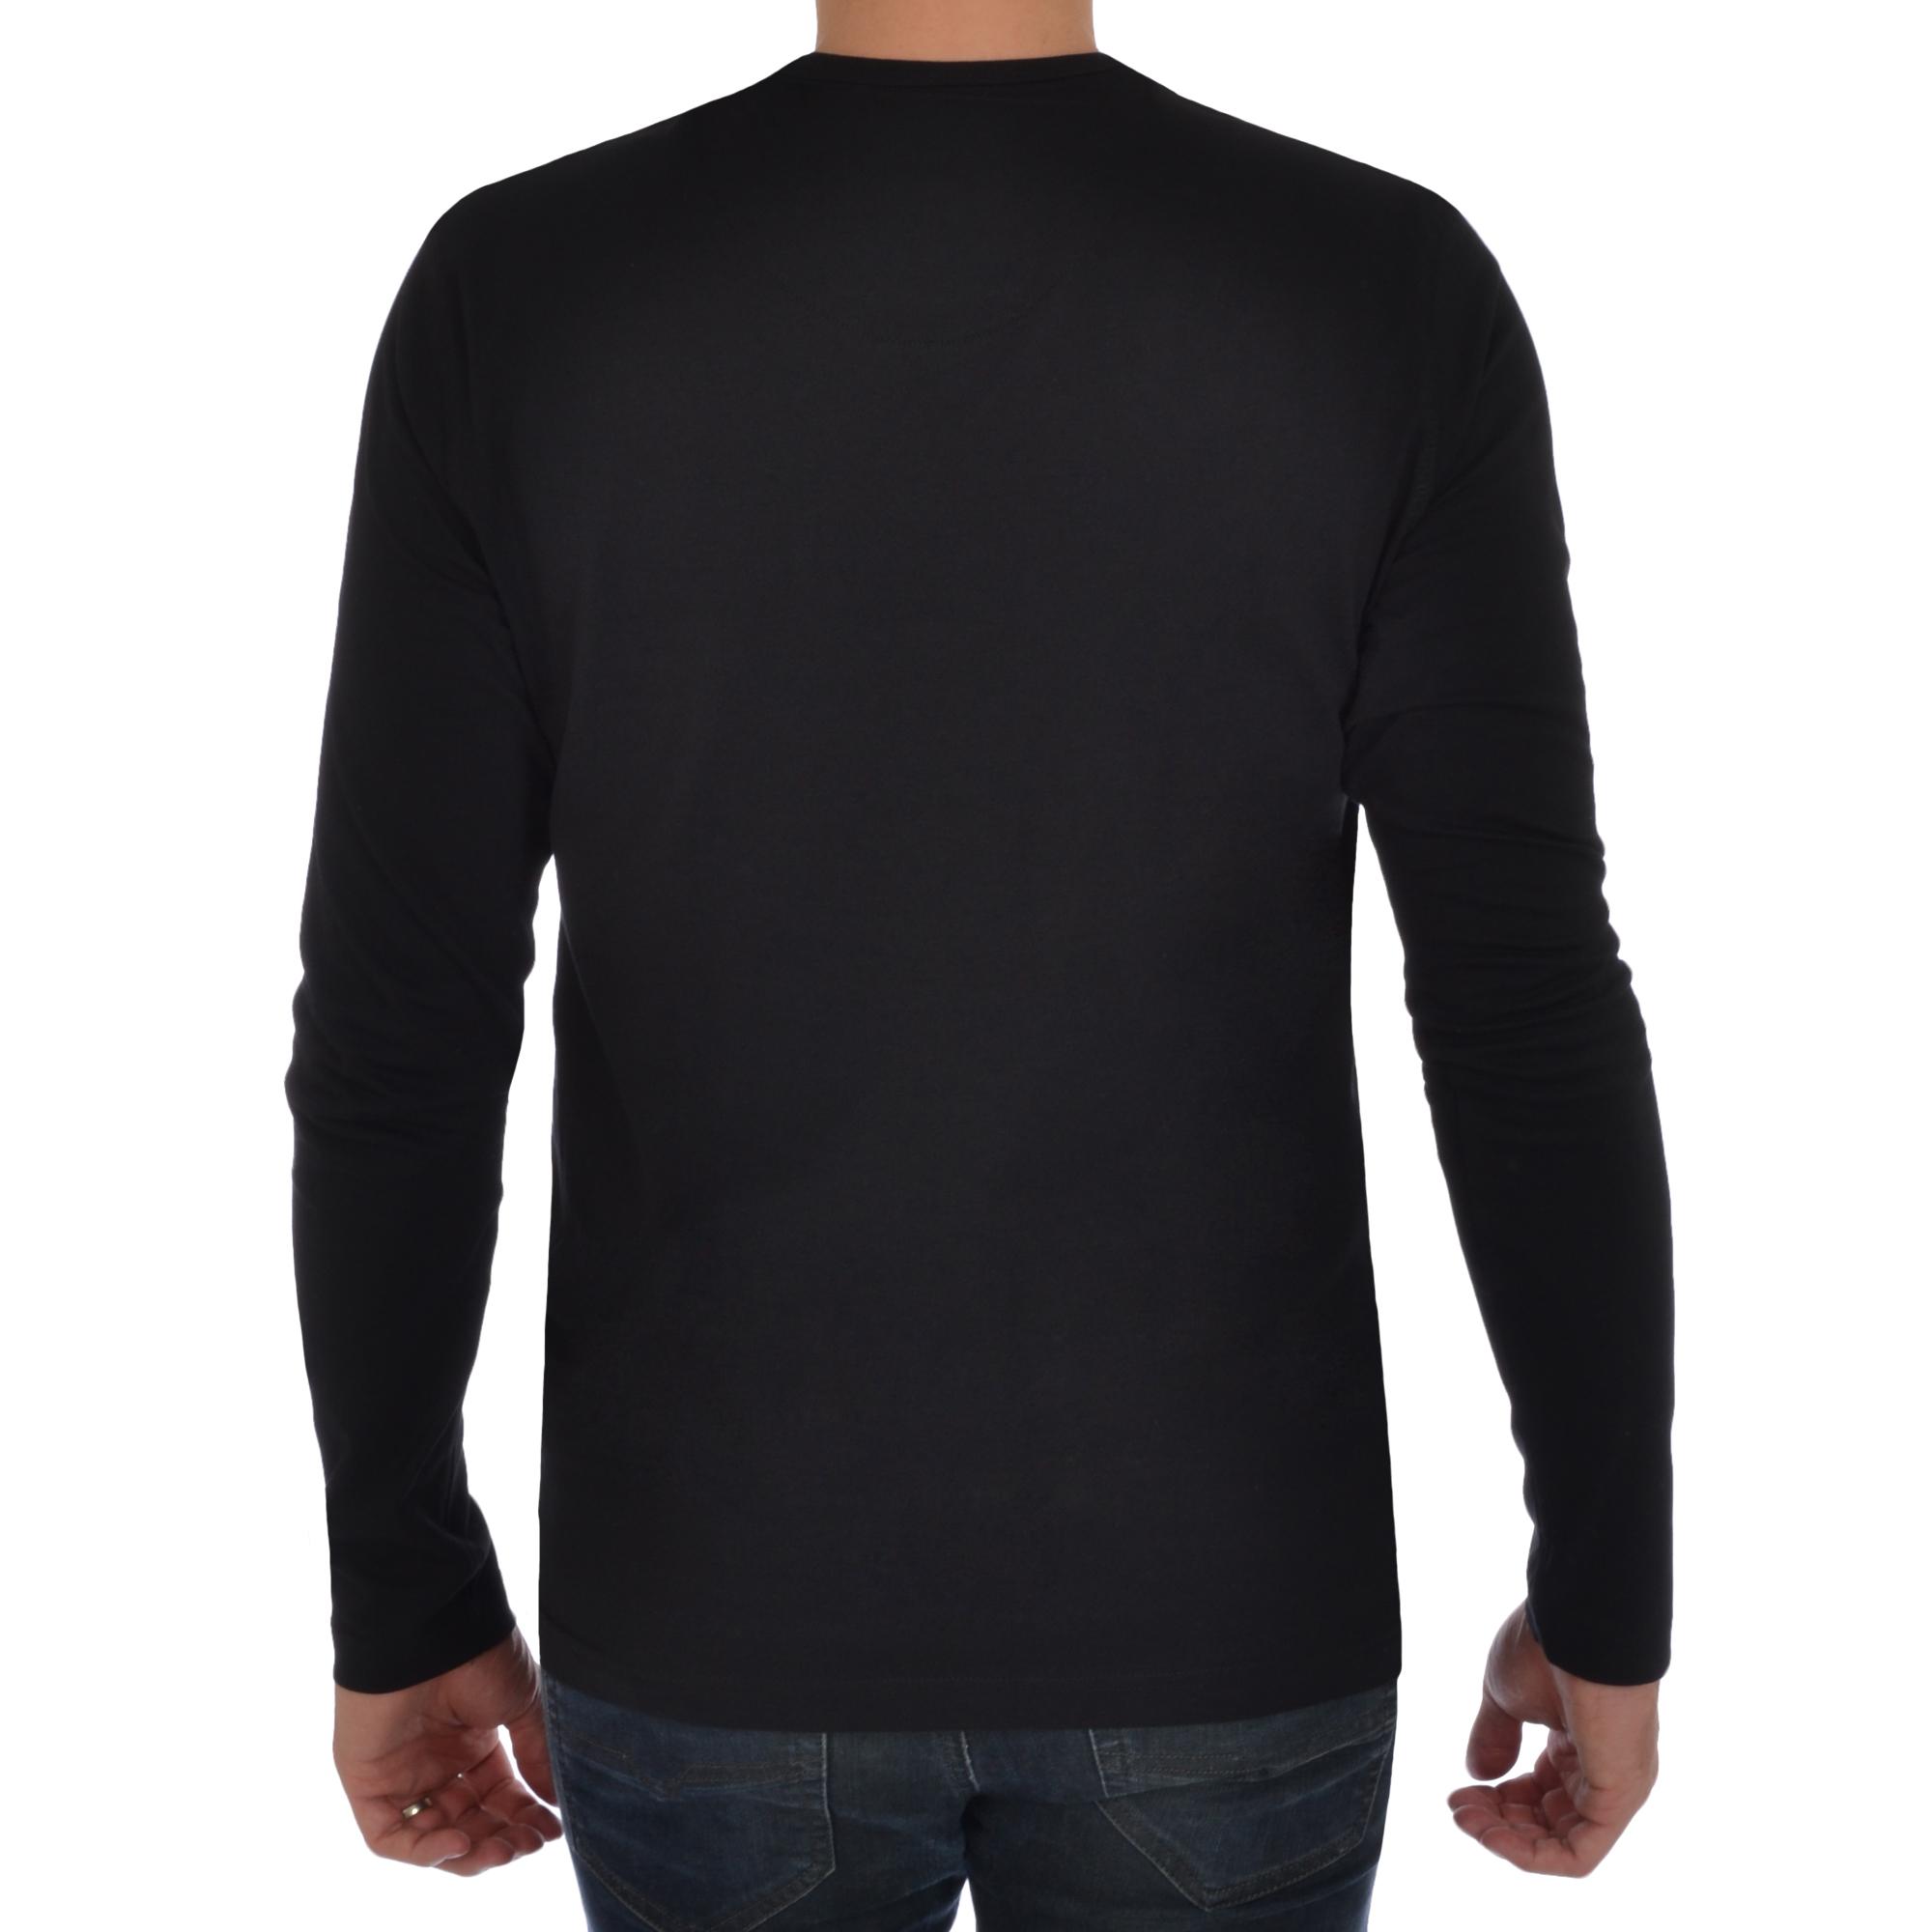 9cf767348385 Brave Soul Mens Long Sleeve T-Shirt Plain Crew Neck Casual Top   eBay